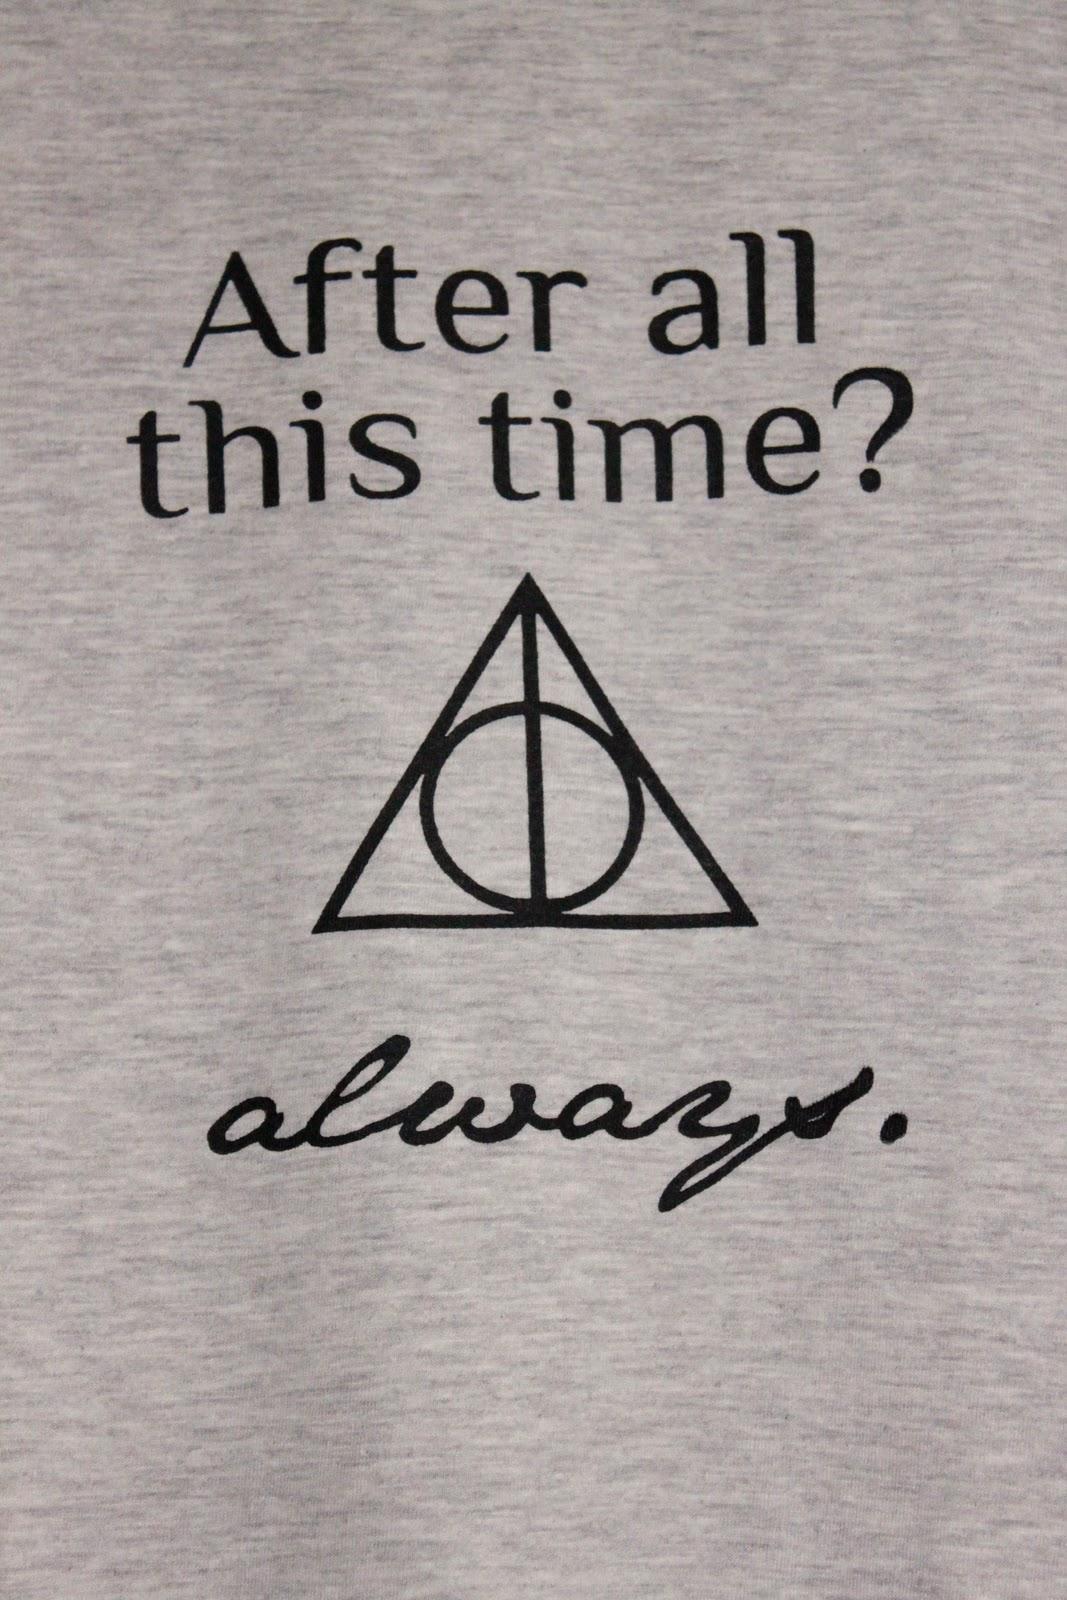 Harry Potter Famous Quotes. QuotesGram